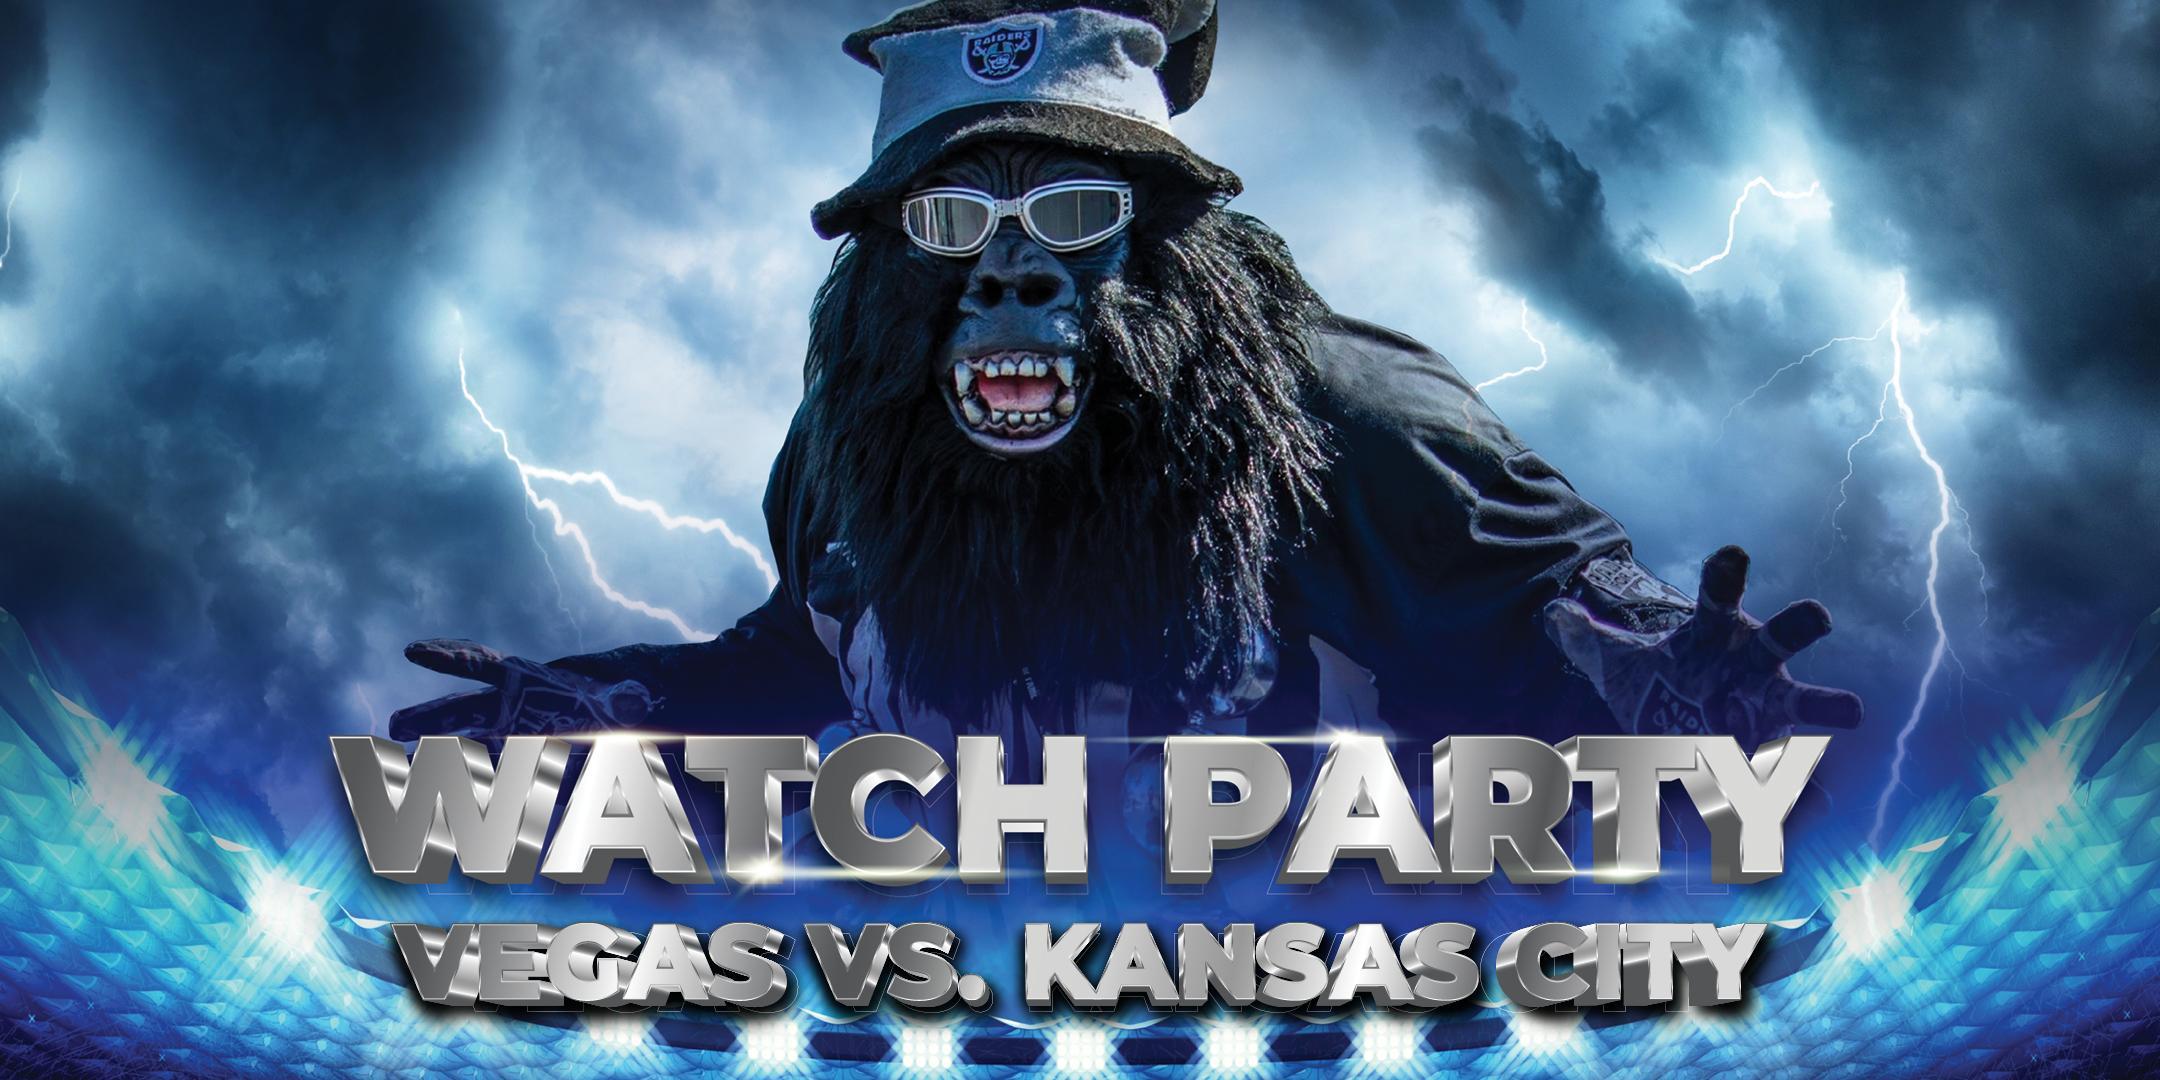 Vegas vs Kansas City Watch Party With Gorilla Rilla at SAHARA Las Vegas